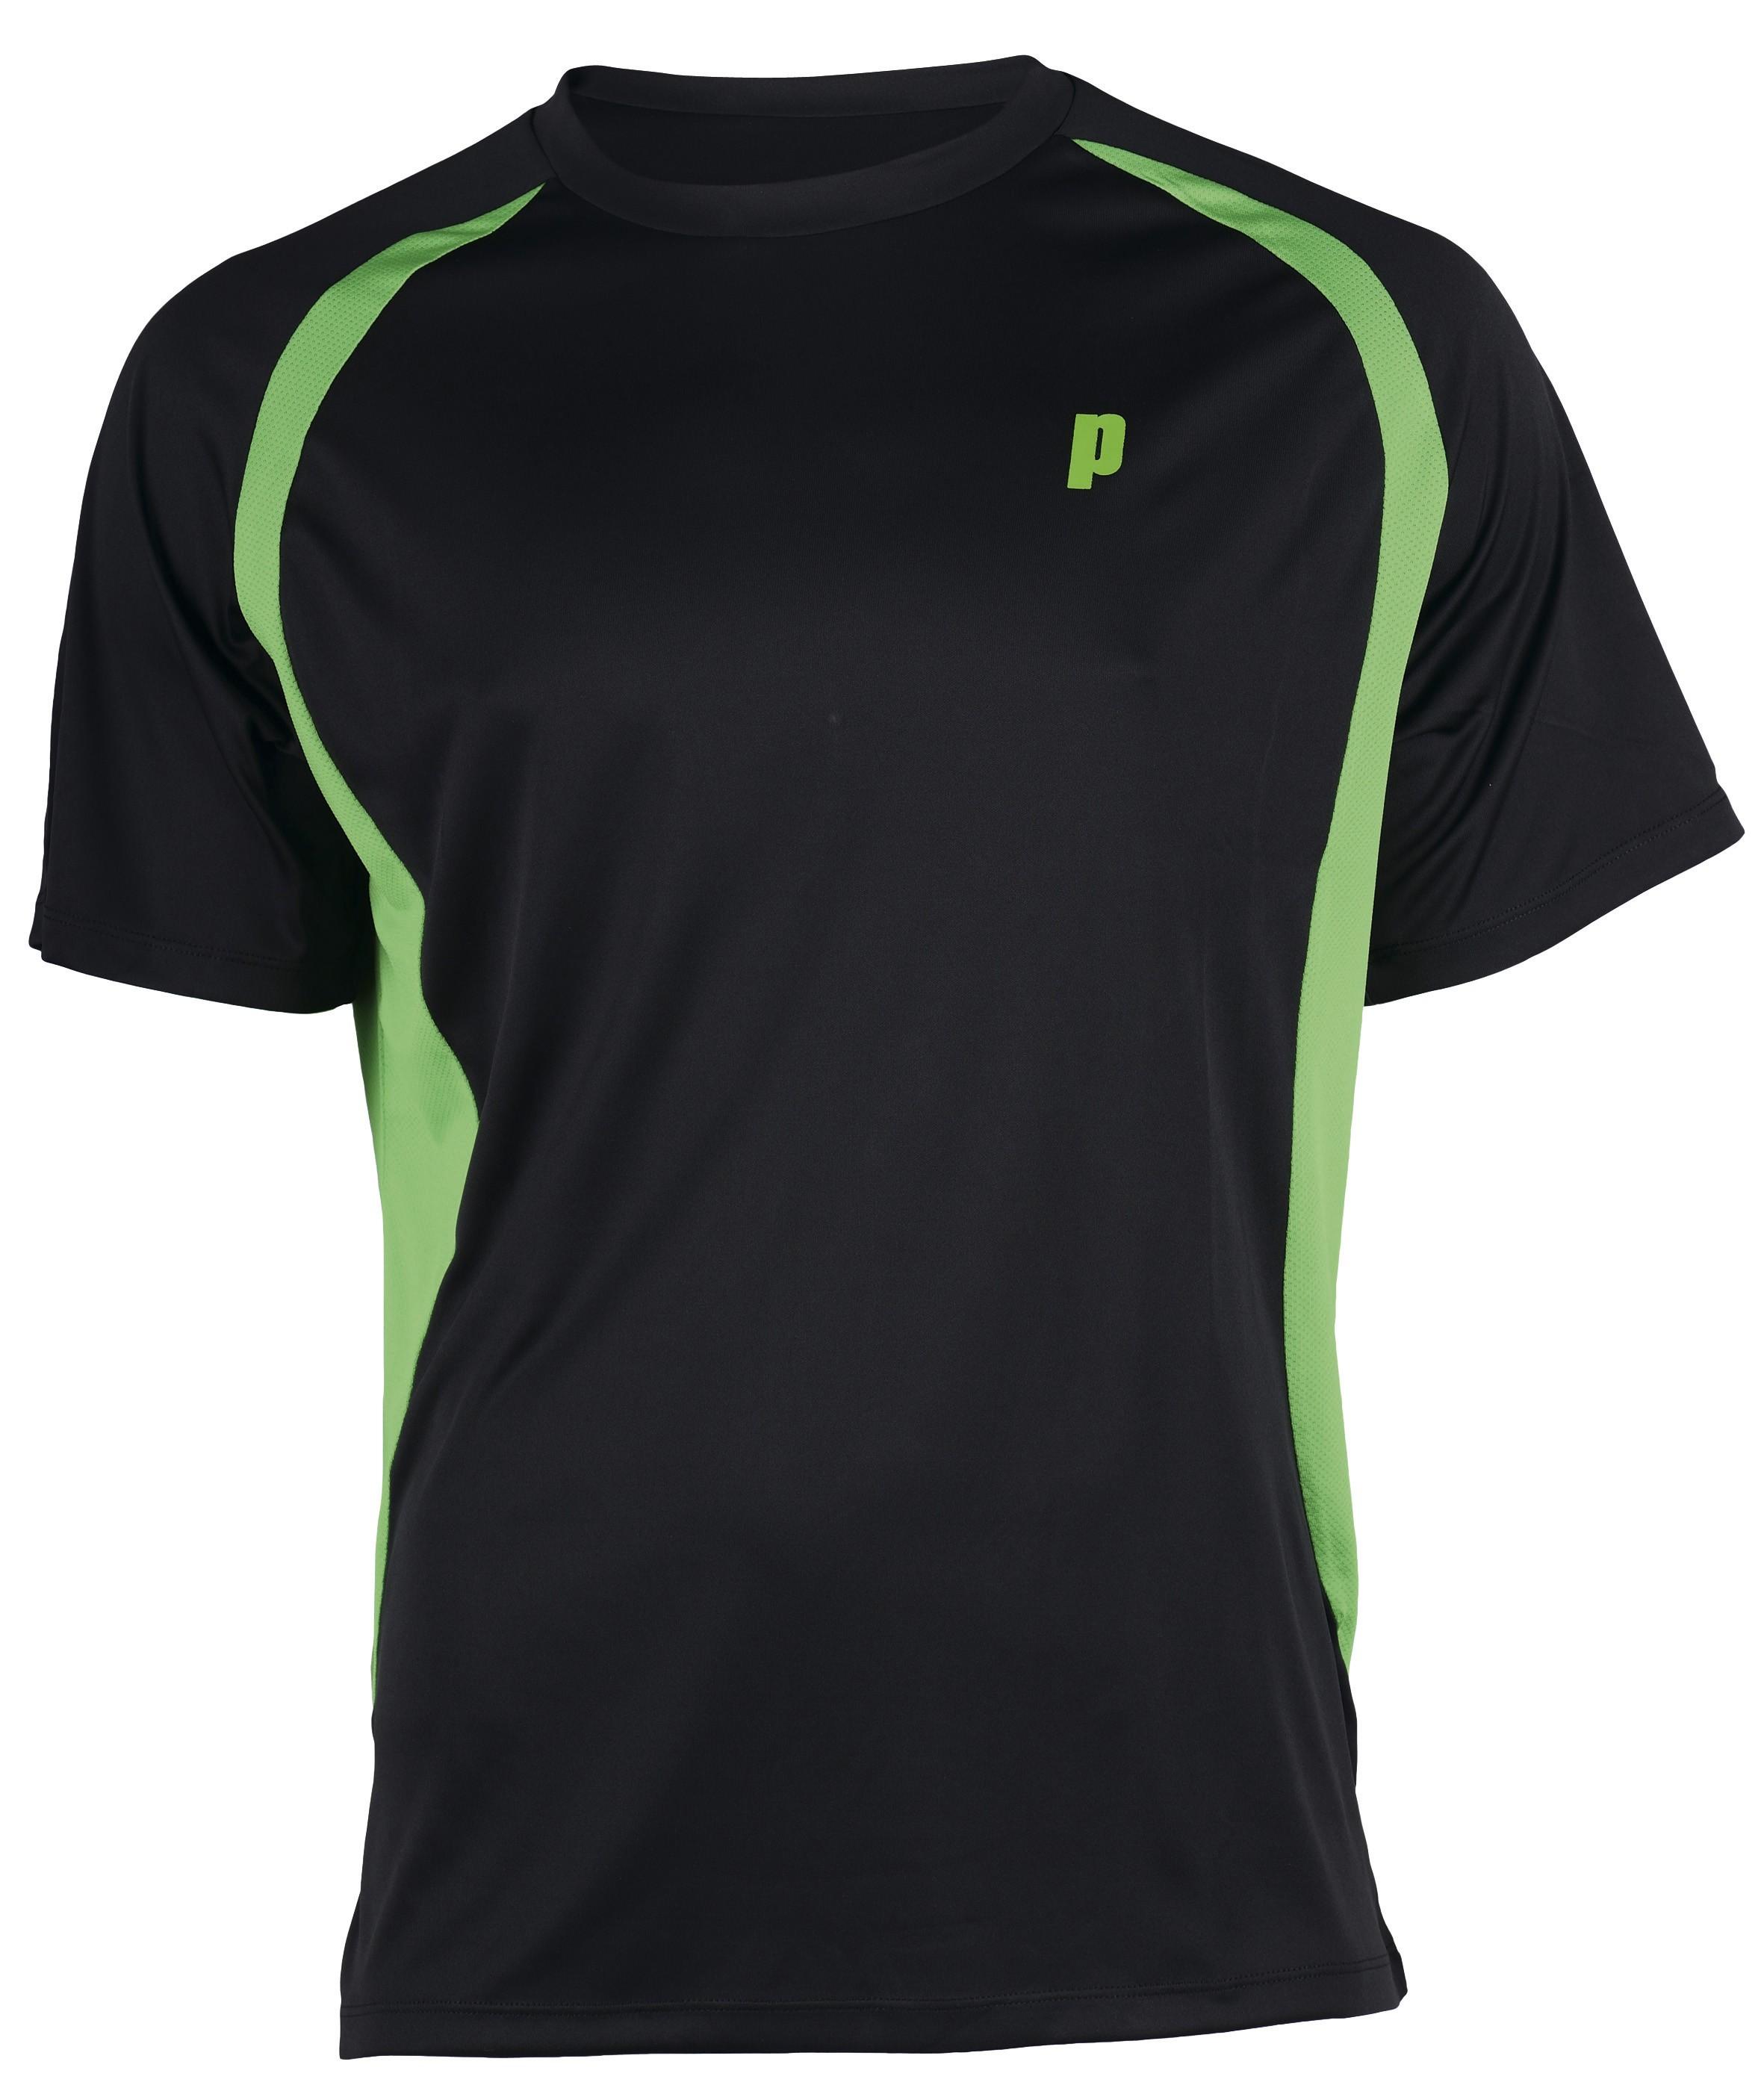 Pánské tenisové tričko Prince Crew black L